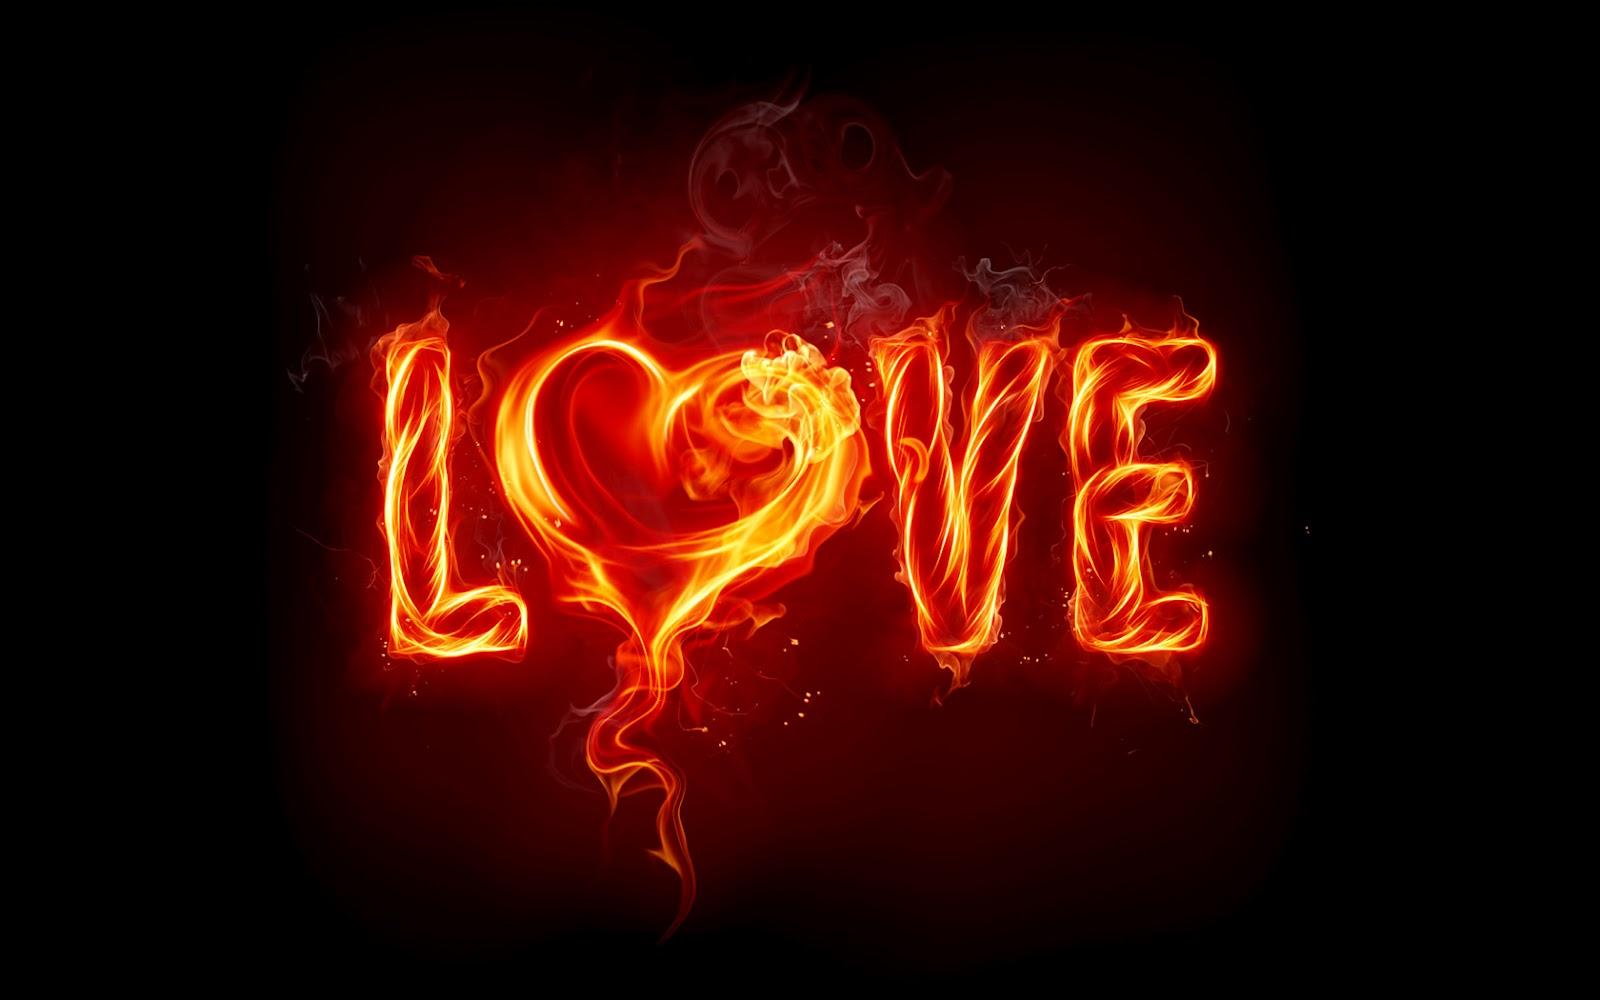 Hd zwarte wallpapers achtergronden - Y letter love wallpaper hd ...